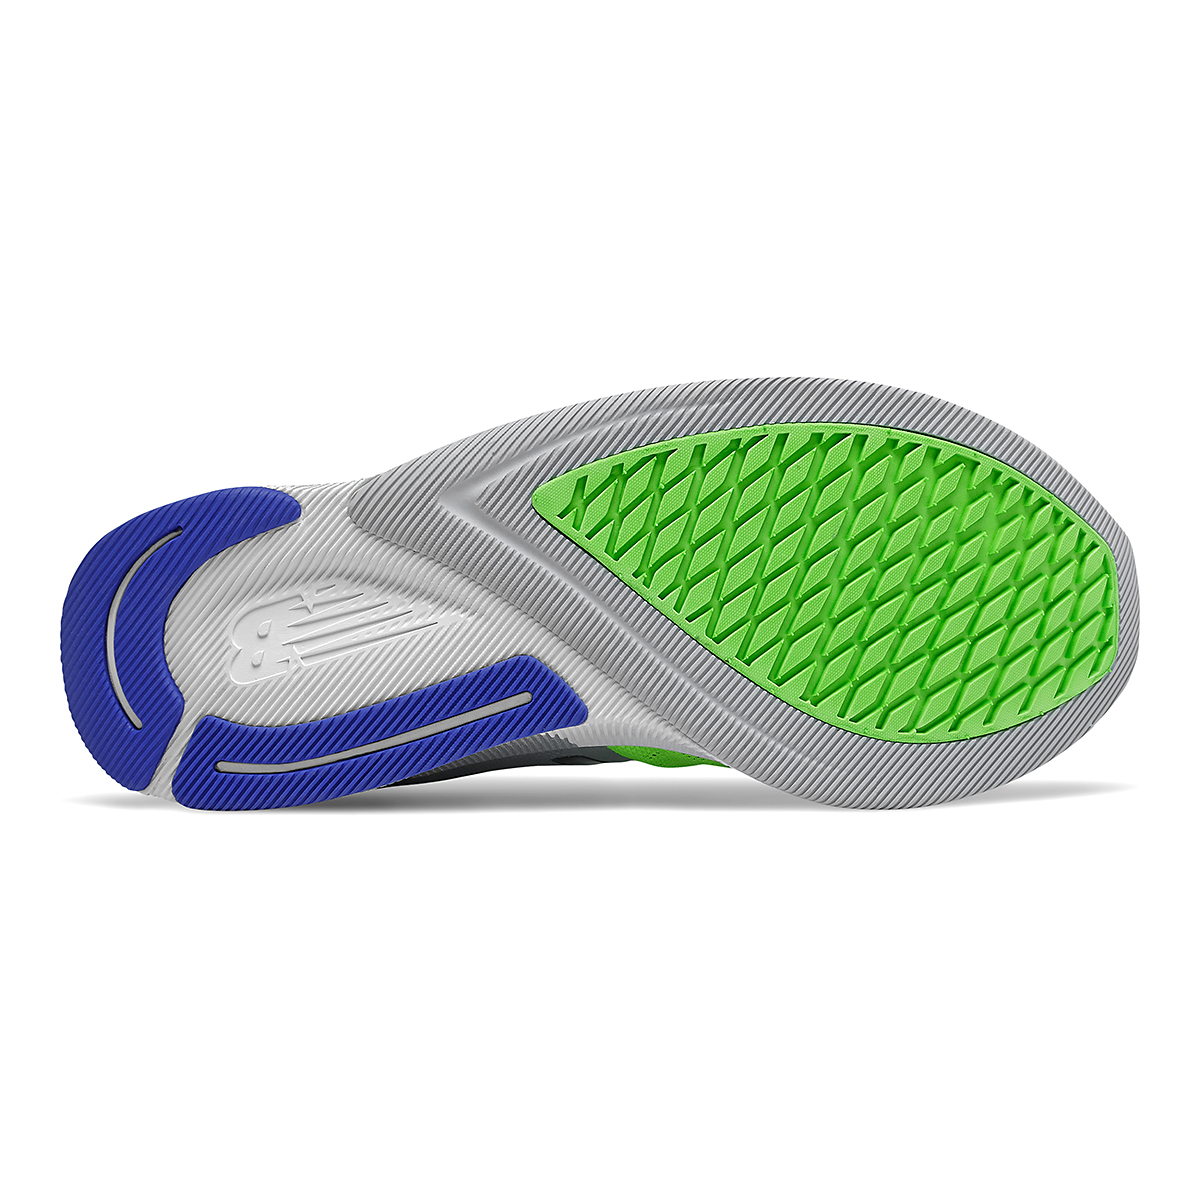 Men's New Balance 890V8 Running Shoe - Color: Energy Lime - Size: 8.5 - Width: Wide, Energy Lime, large, image 4